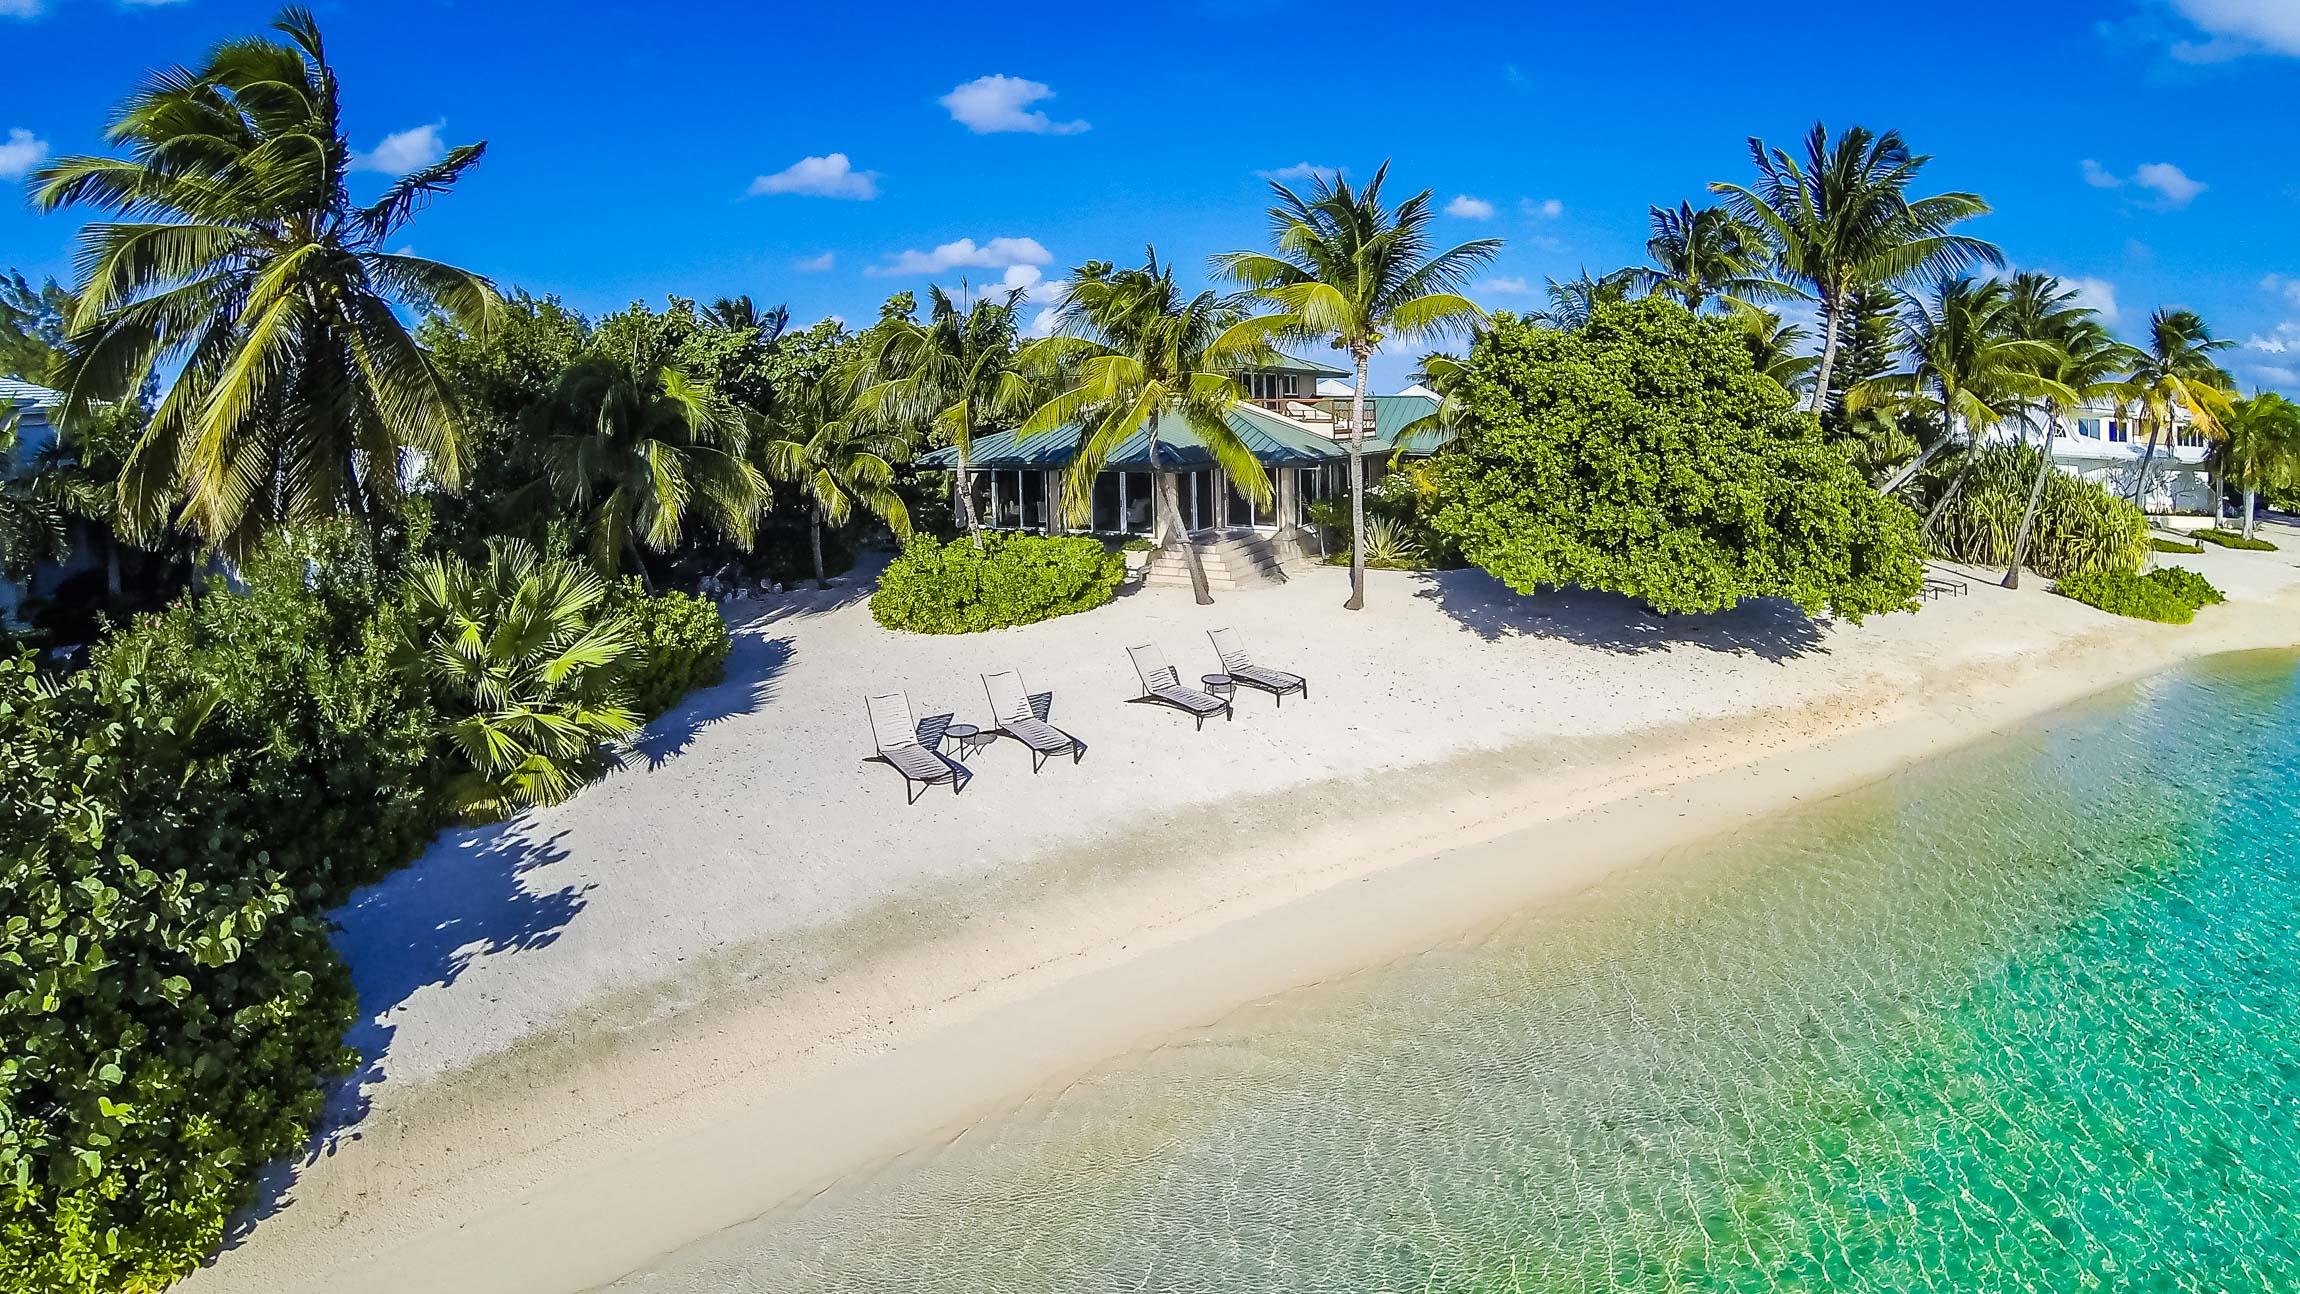 CaymanIslands_Tarasand_-17.jpg